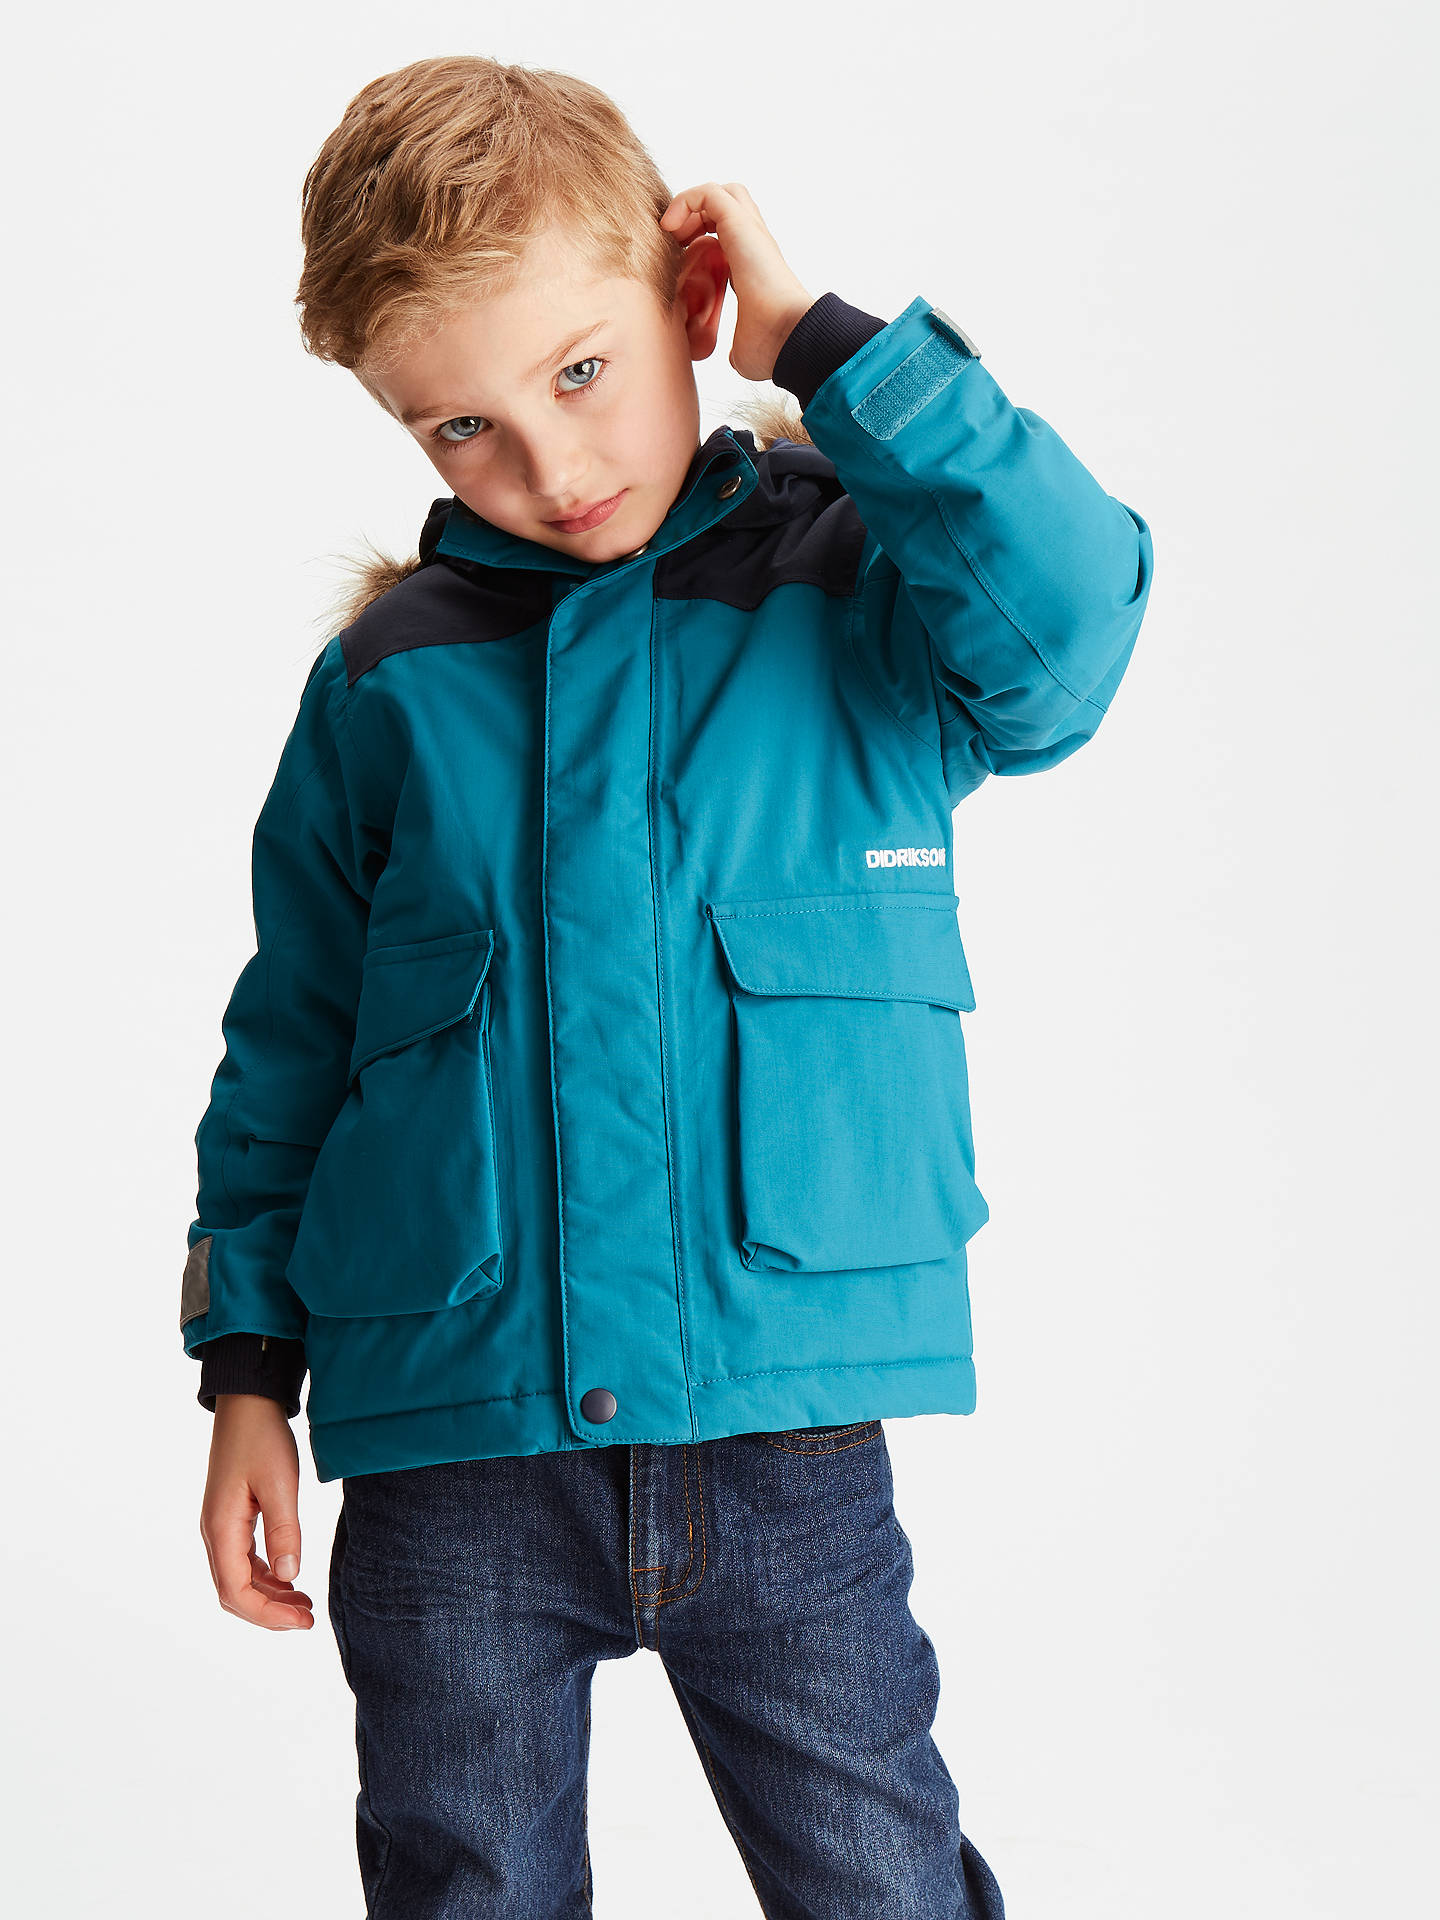 ddd16596fd Didriksons Boys  Kure Waterproof Parka Jacket at John Lewis   Partners